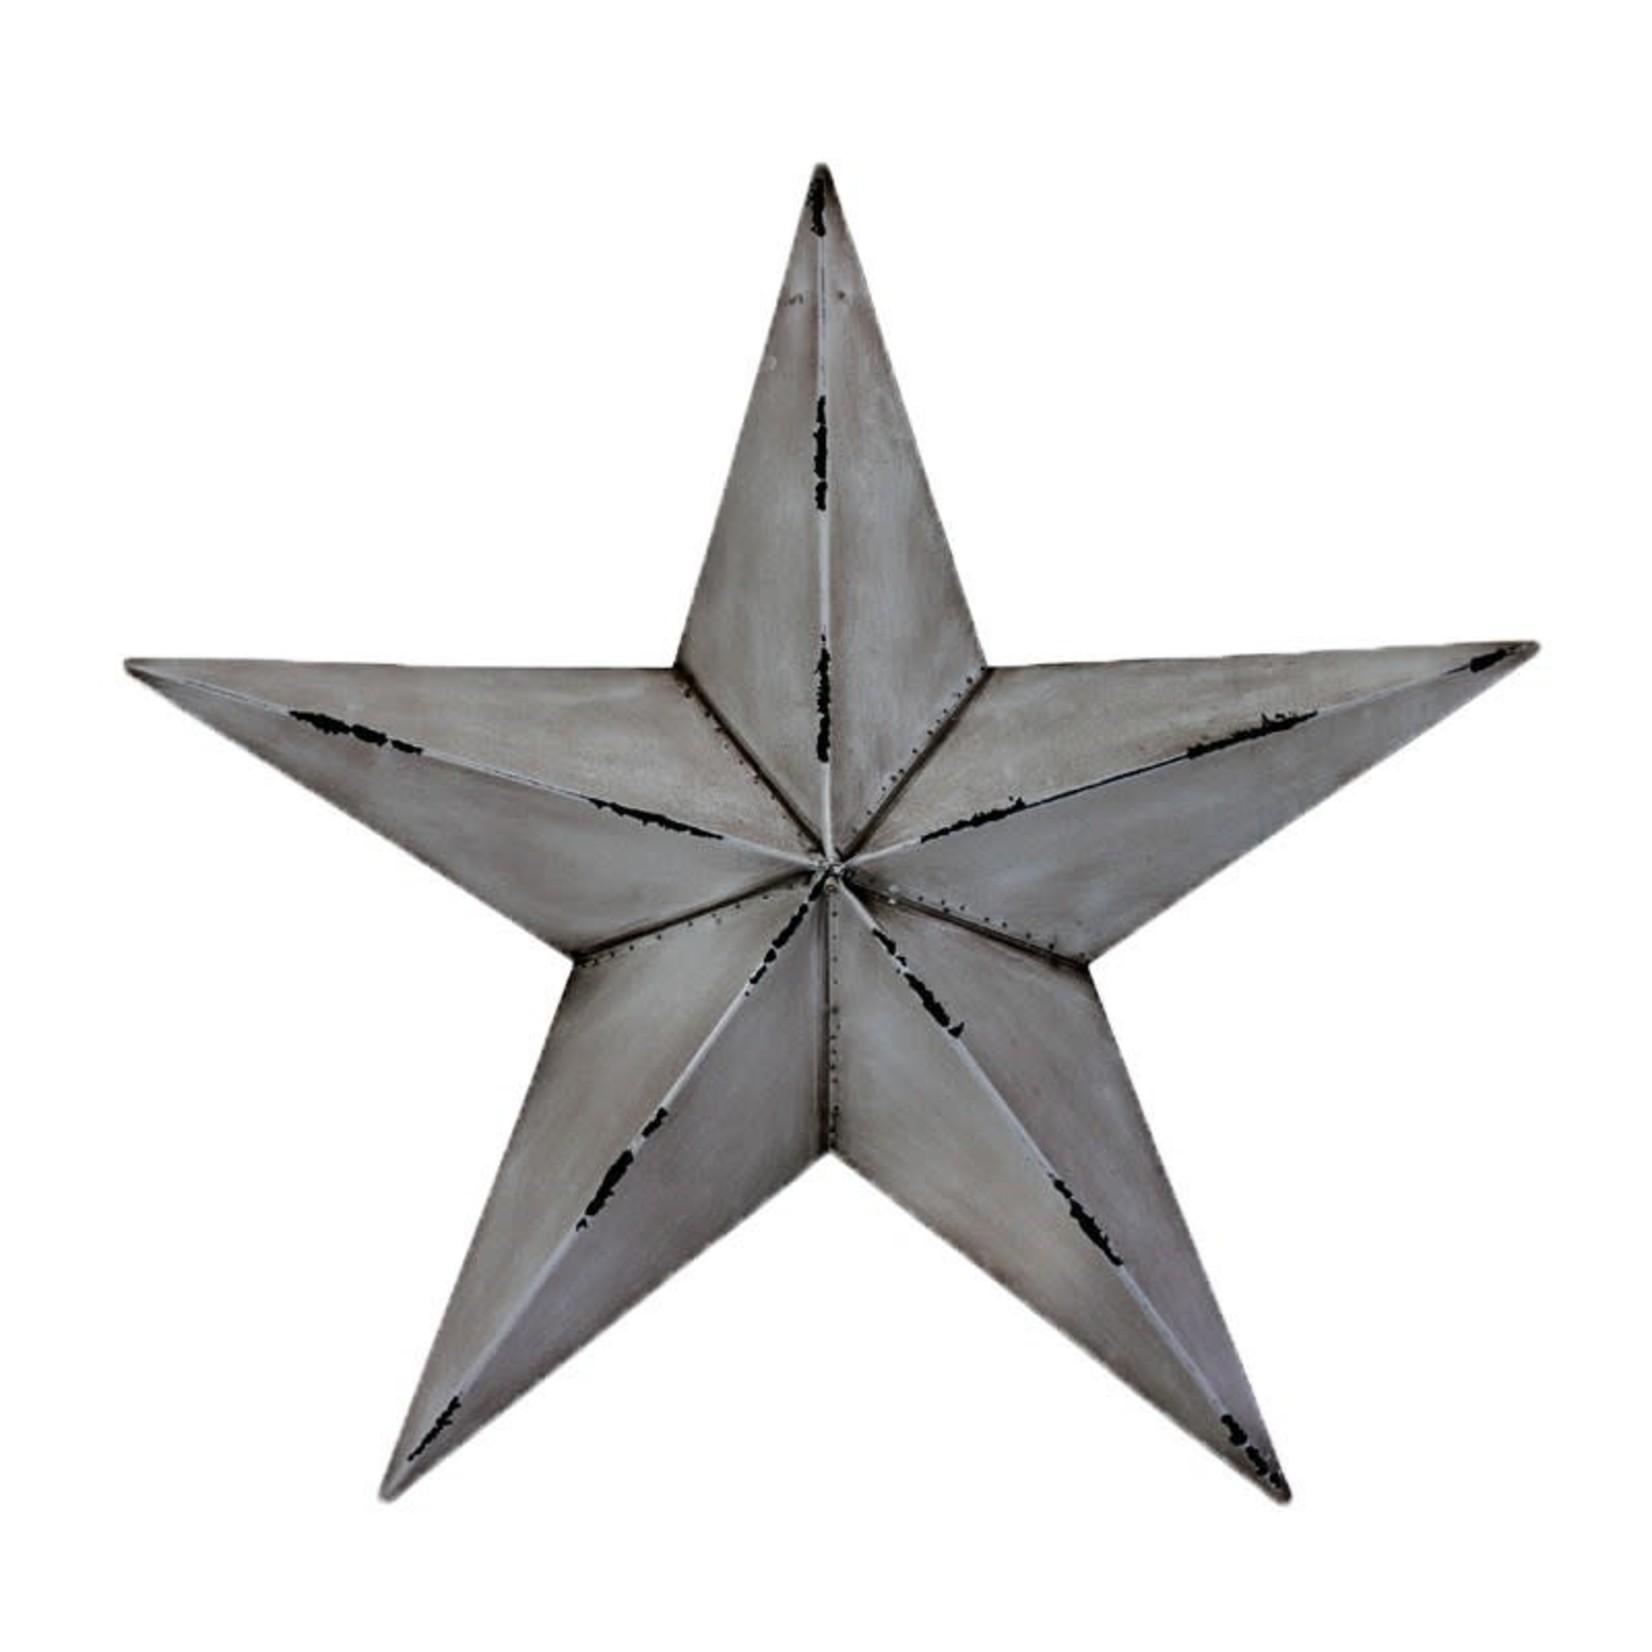 Antique Star